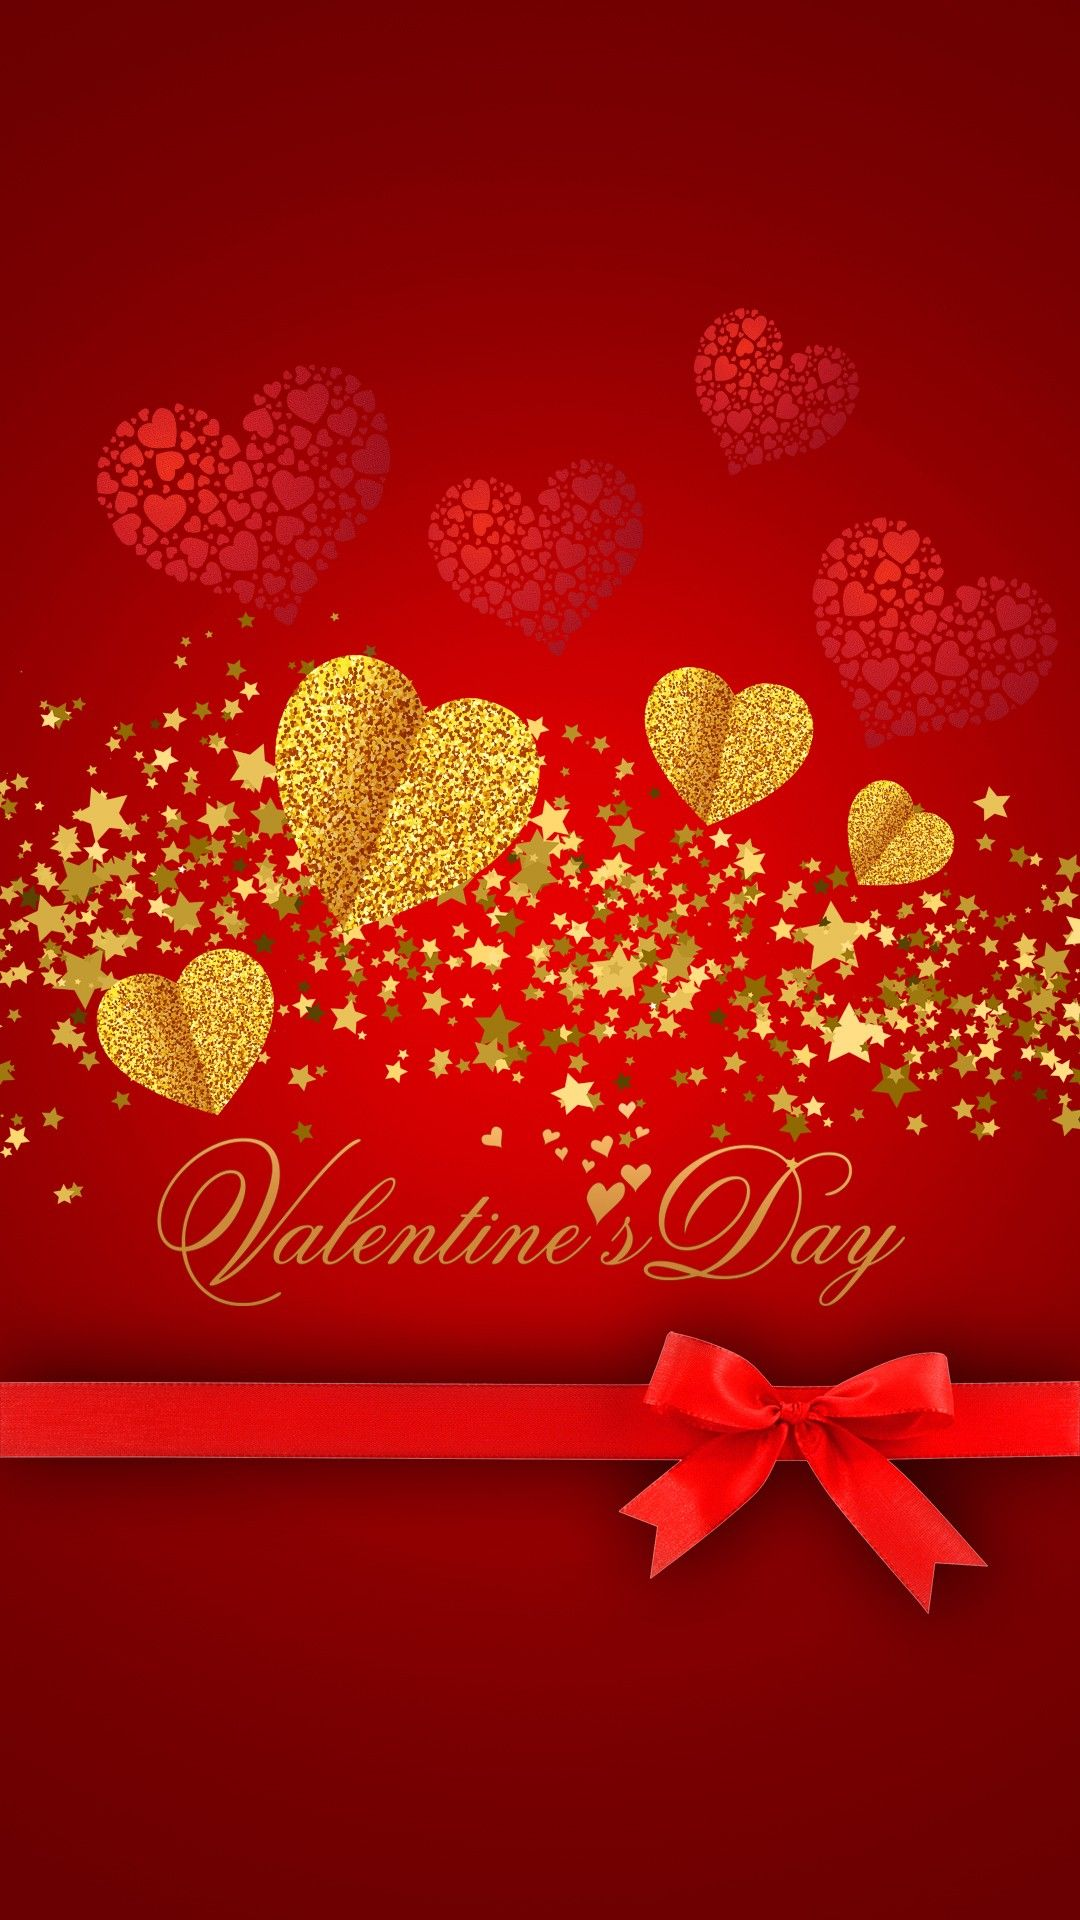 VALENTINE'S DAY IPHONE WALLPAPER Valentines wallpaper